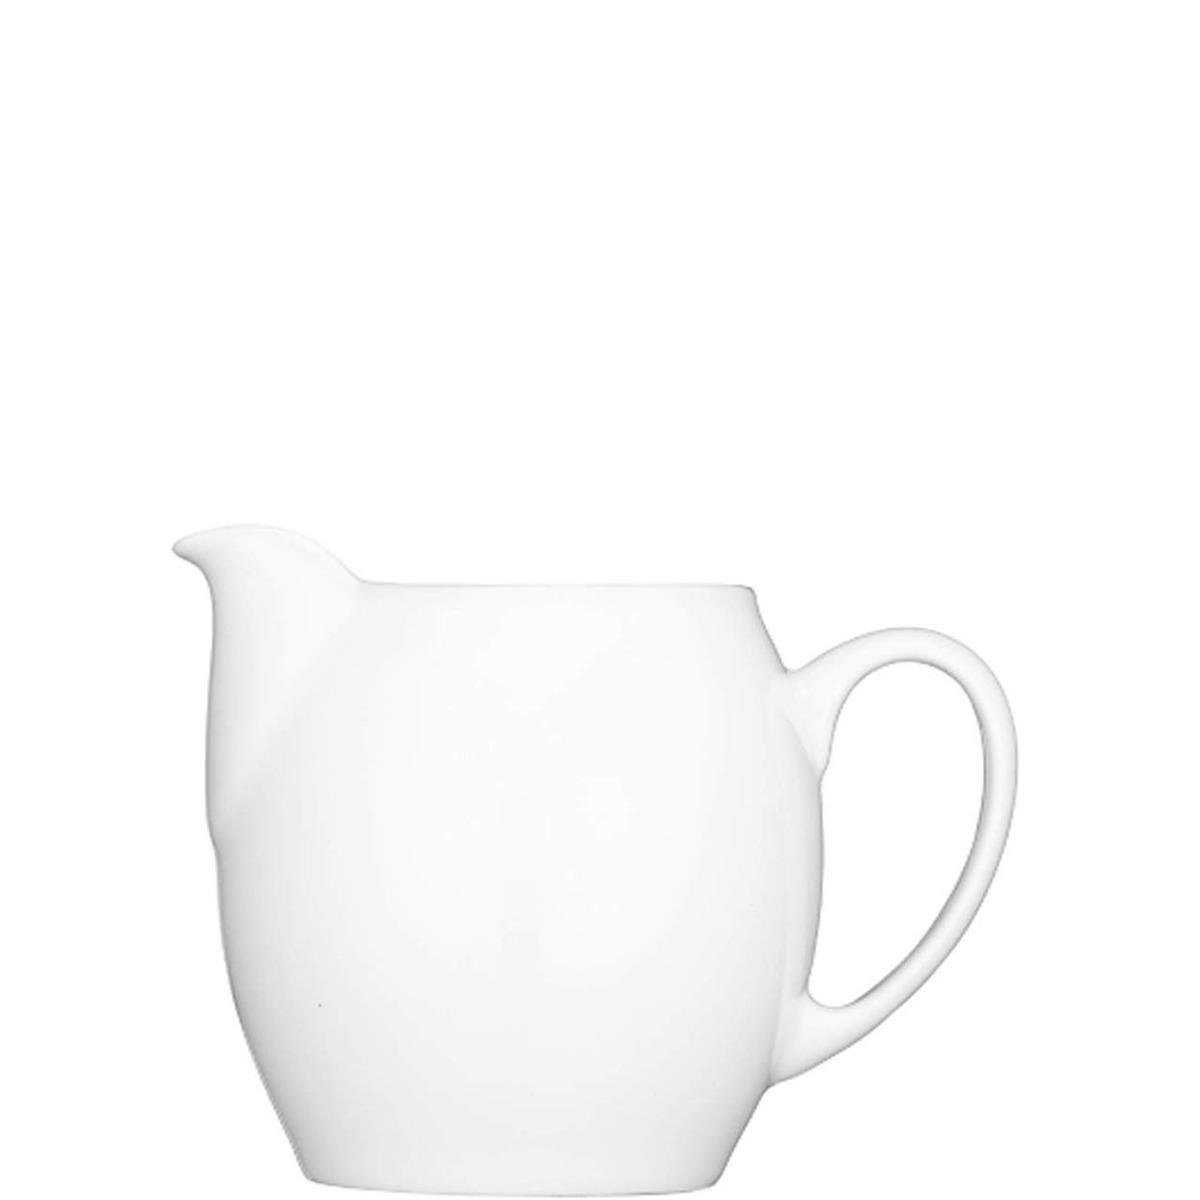 101505323101505462: White Jug Small